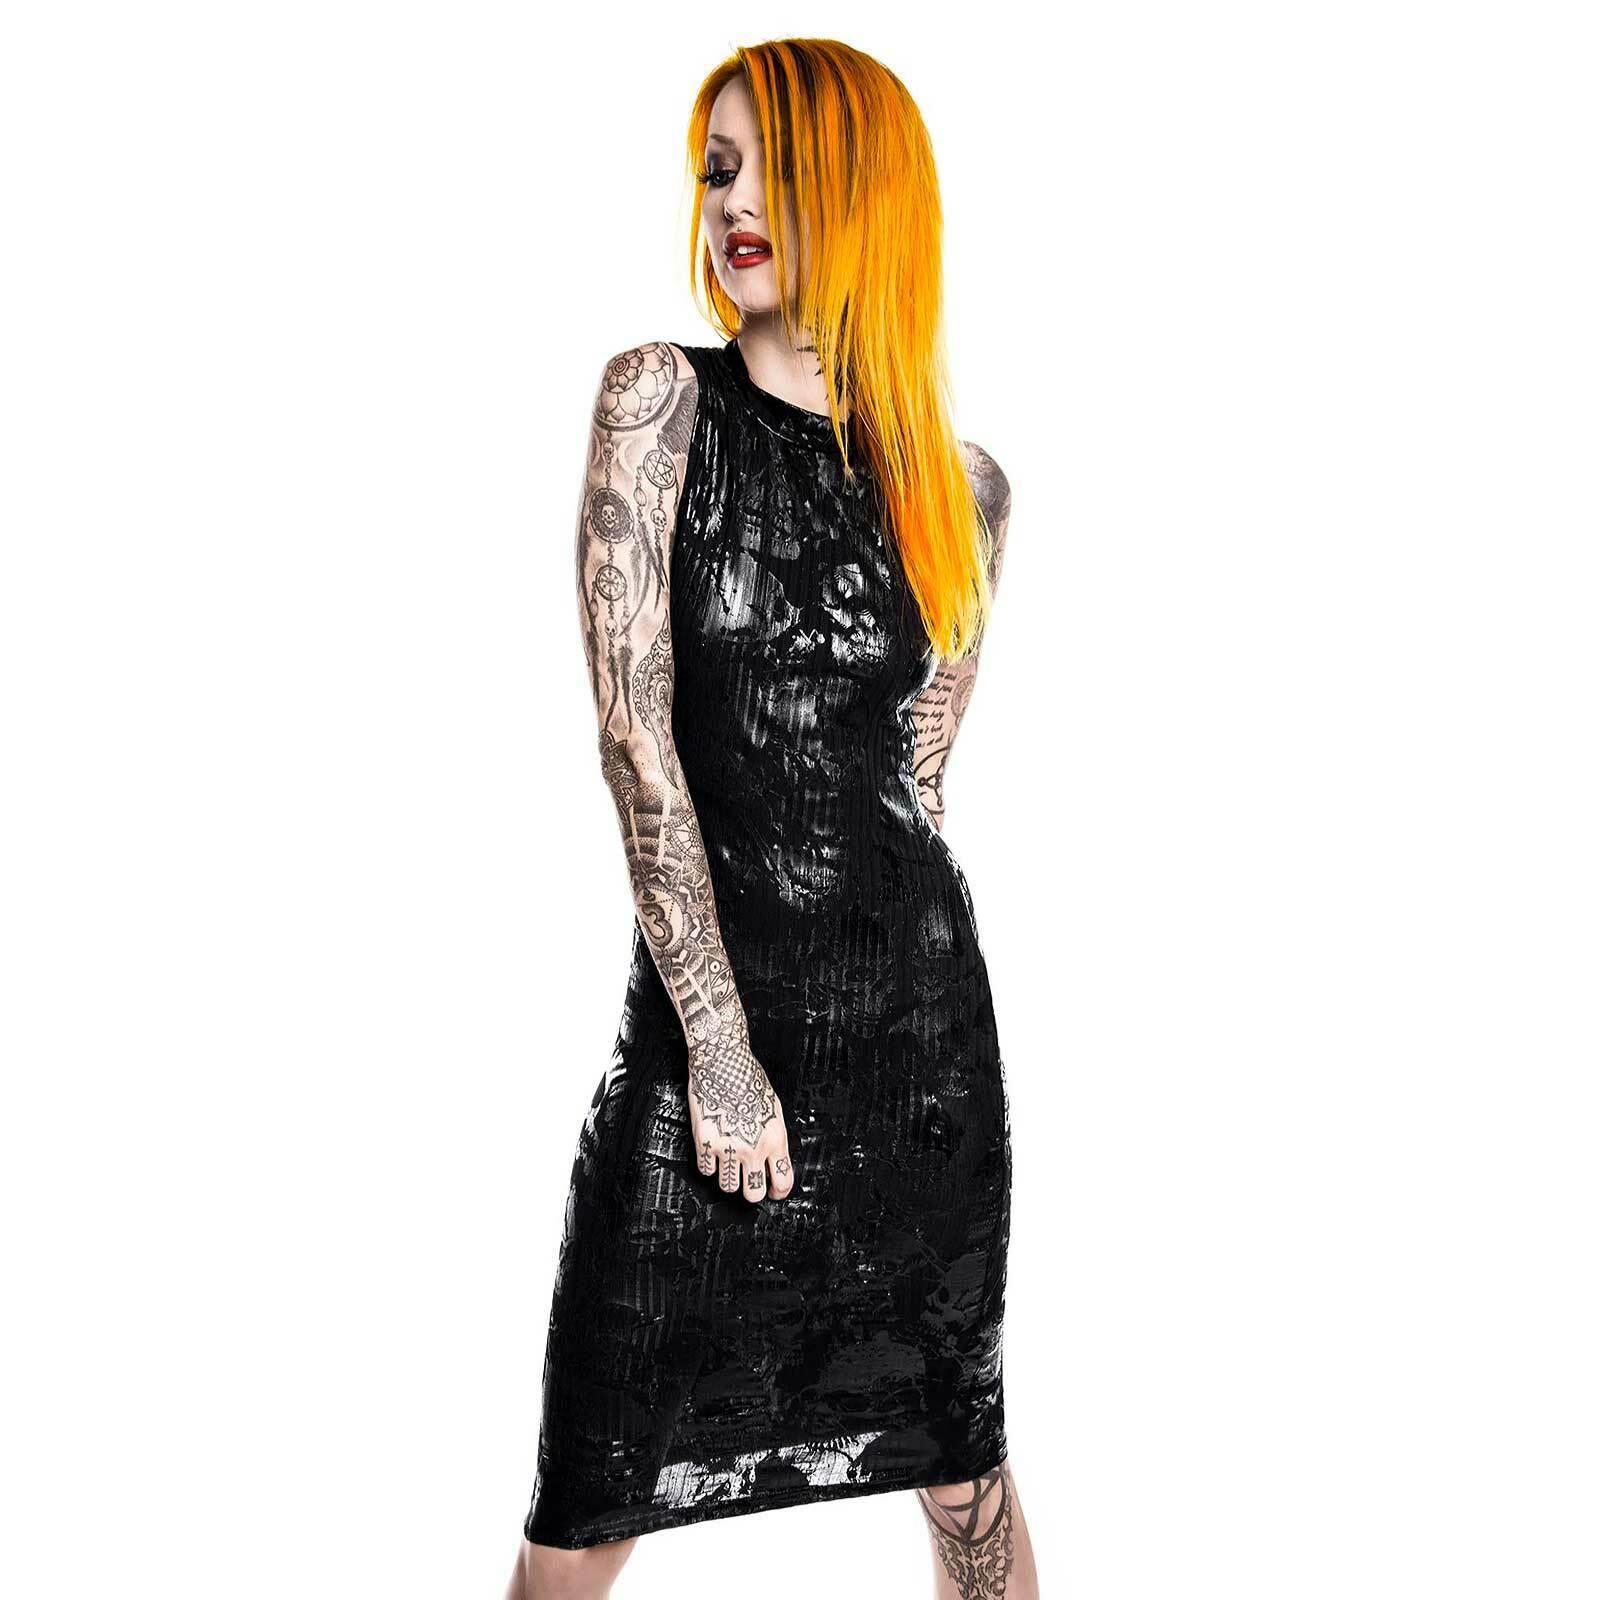 KILLSTAR Chaos Enfant Terrible Dress Bodycon Stretch Kleid Ärmellos Lack Print